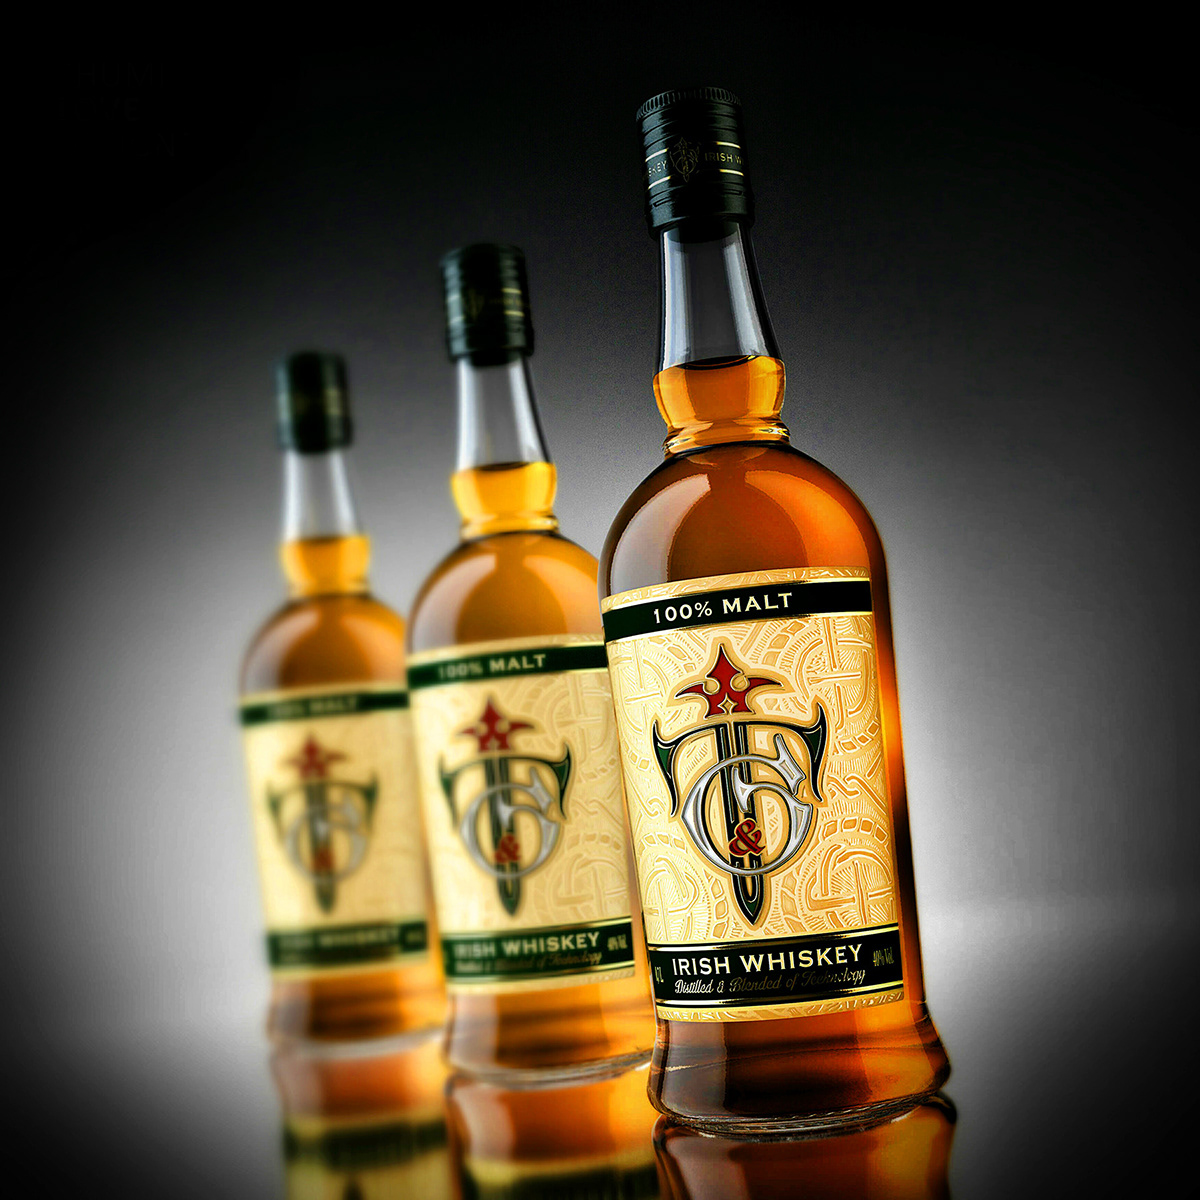 Whiskey label design labeling Sumilov shumilov shumi shumilovedesign shumi love design